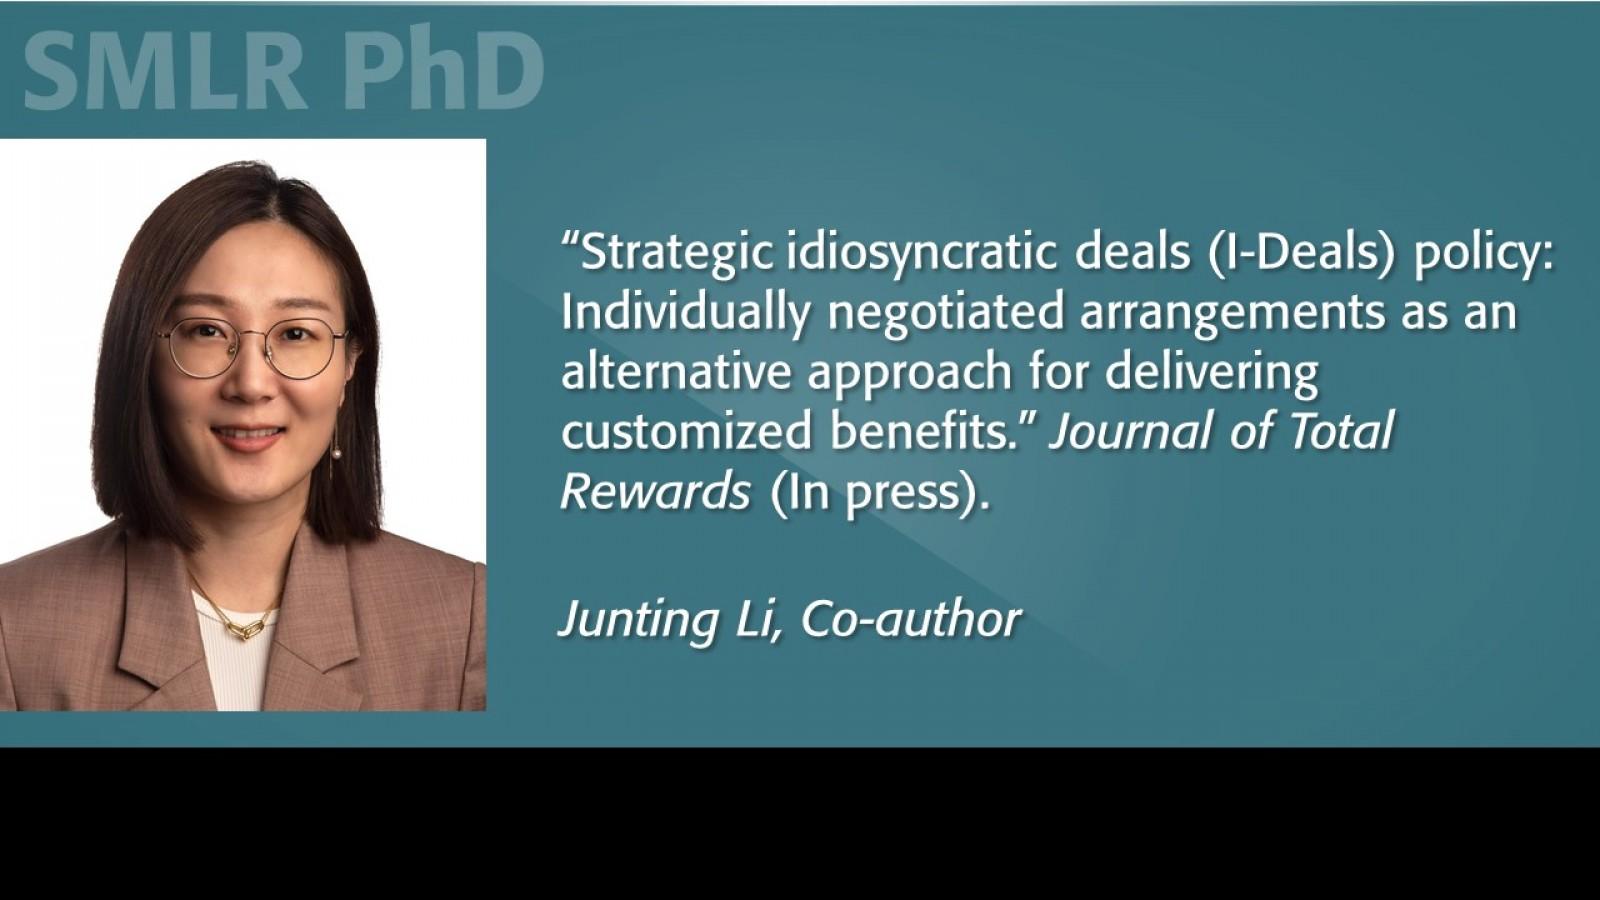 Image of Junting Li